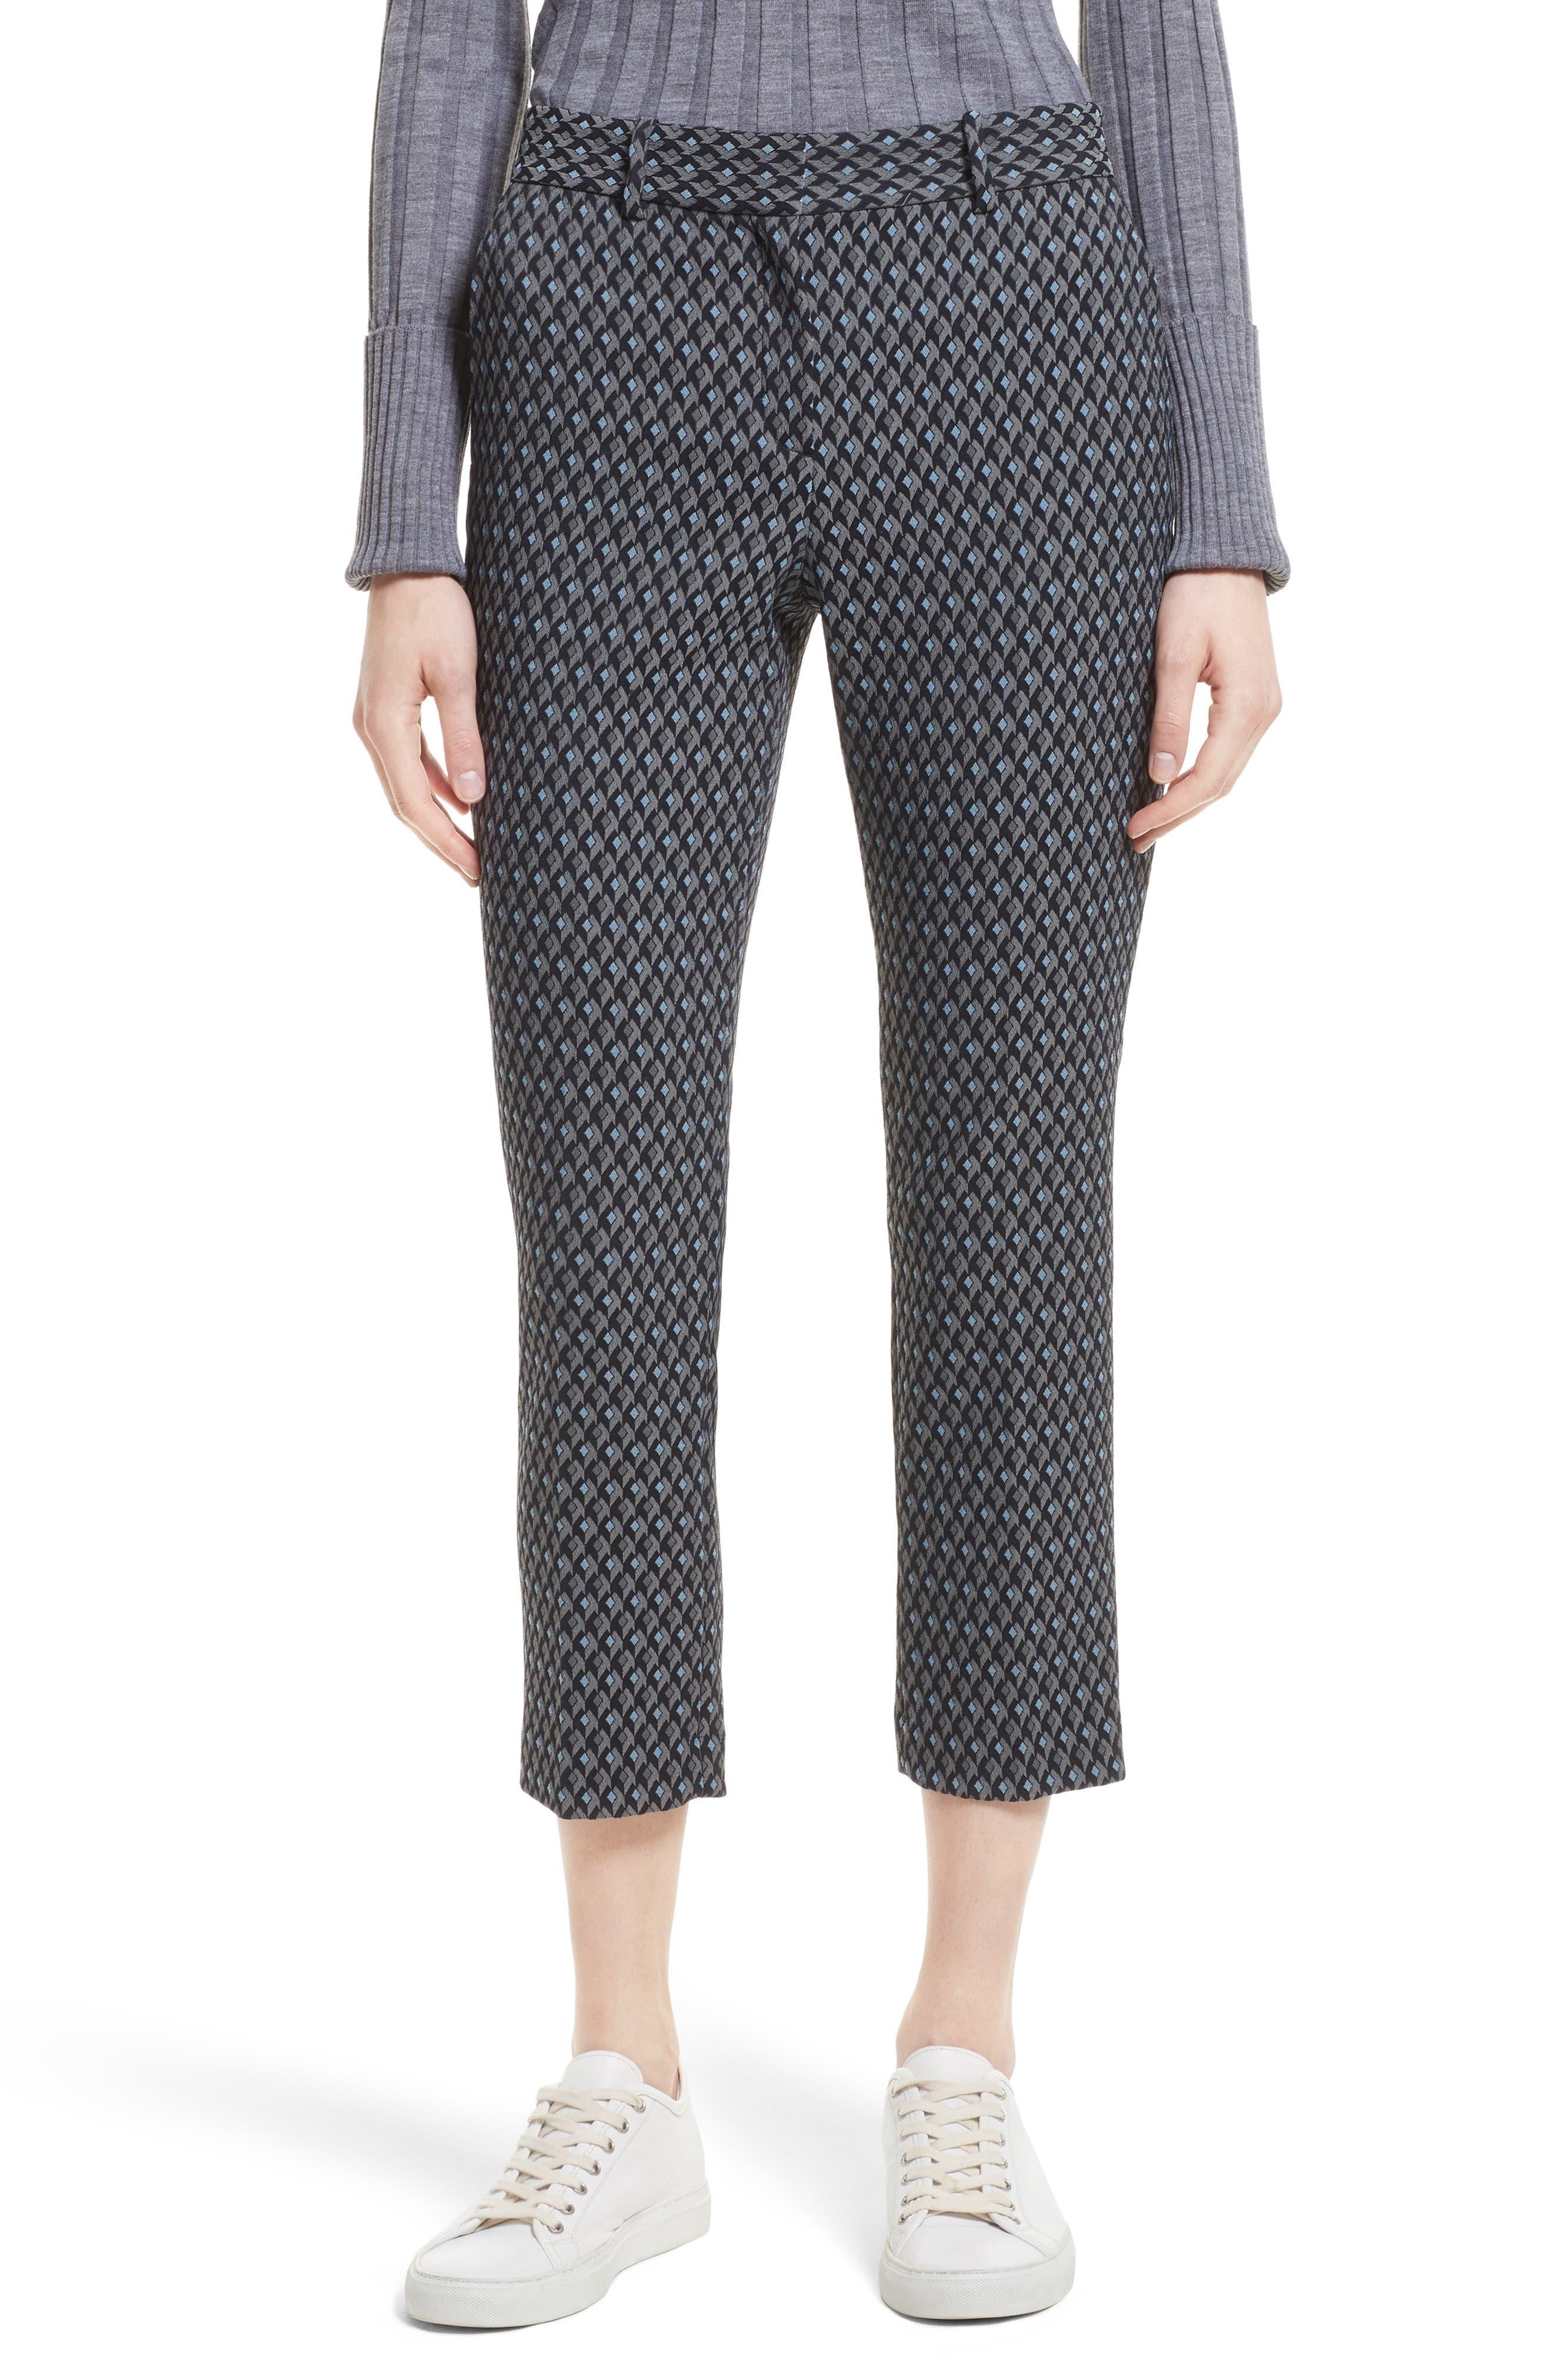 Treeca 2 Geo Jacquard Stretch Crop Pants,                         Main,                         color, 067